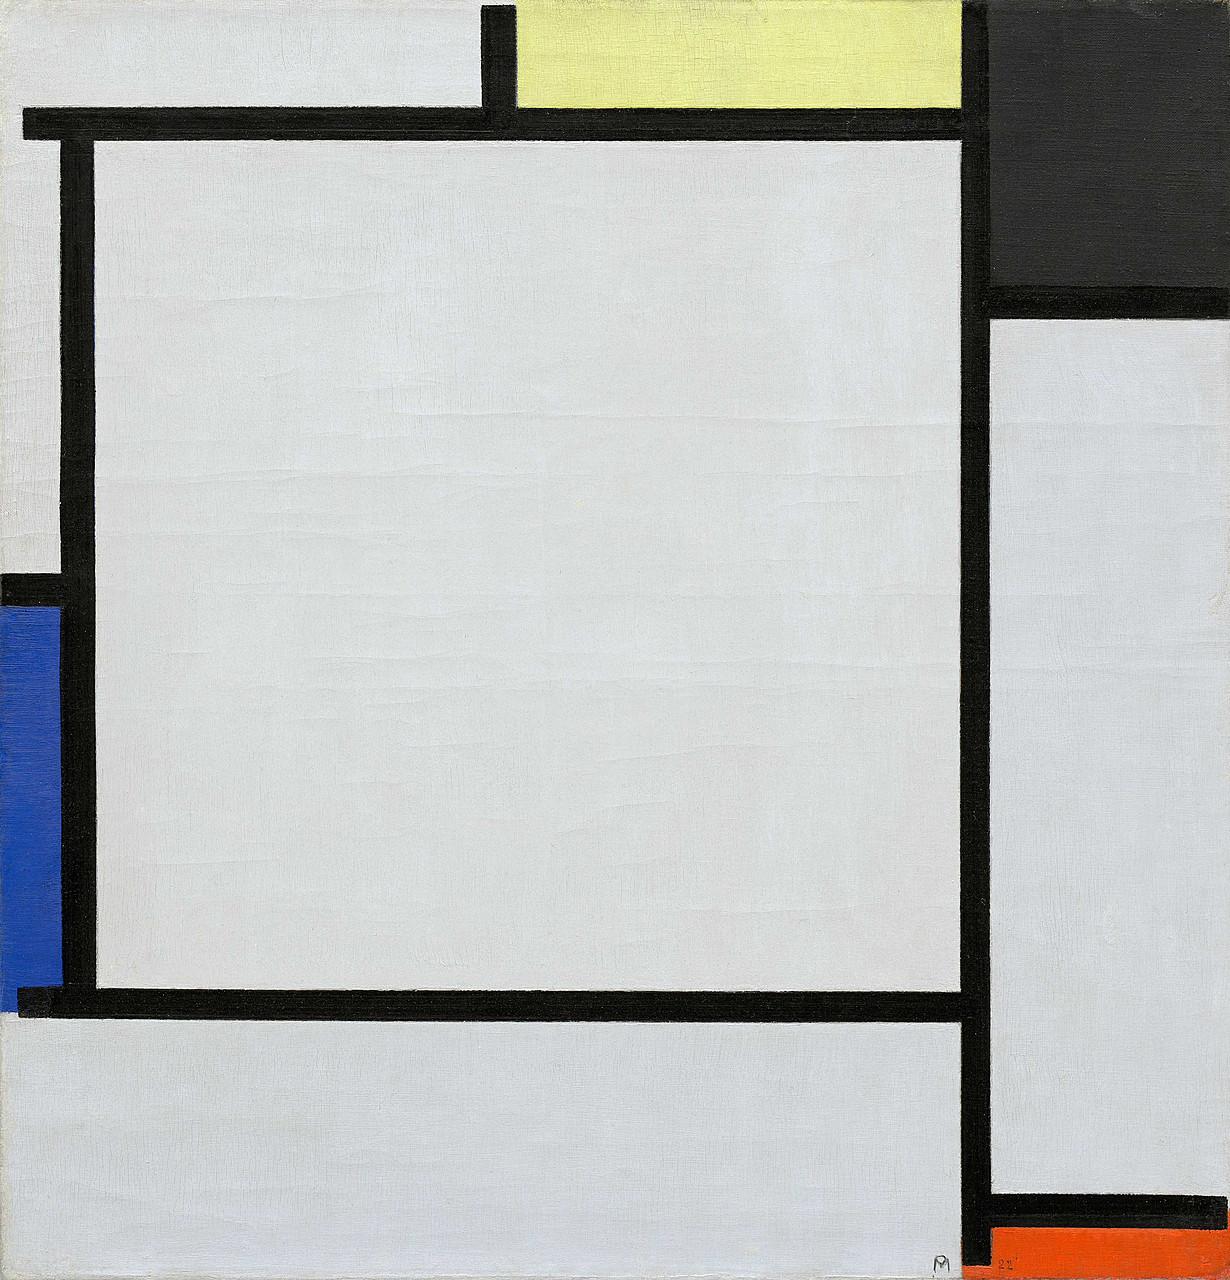 Tout Piet Mondrian en une oeuvre